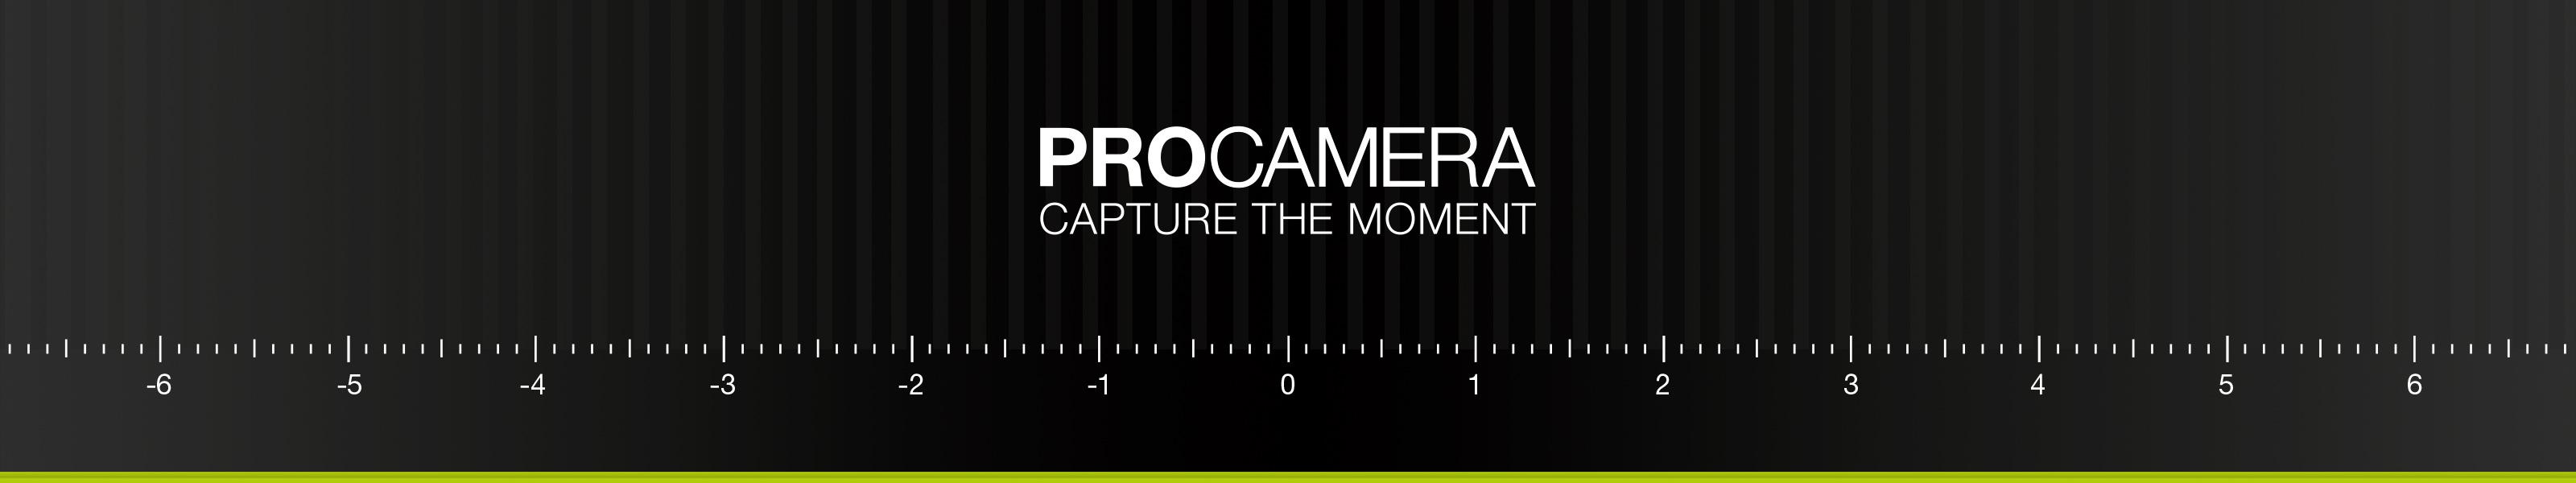 ProCamera - Capture the moment